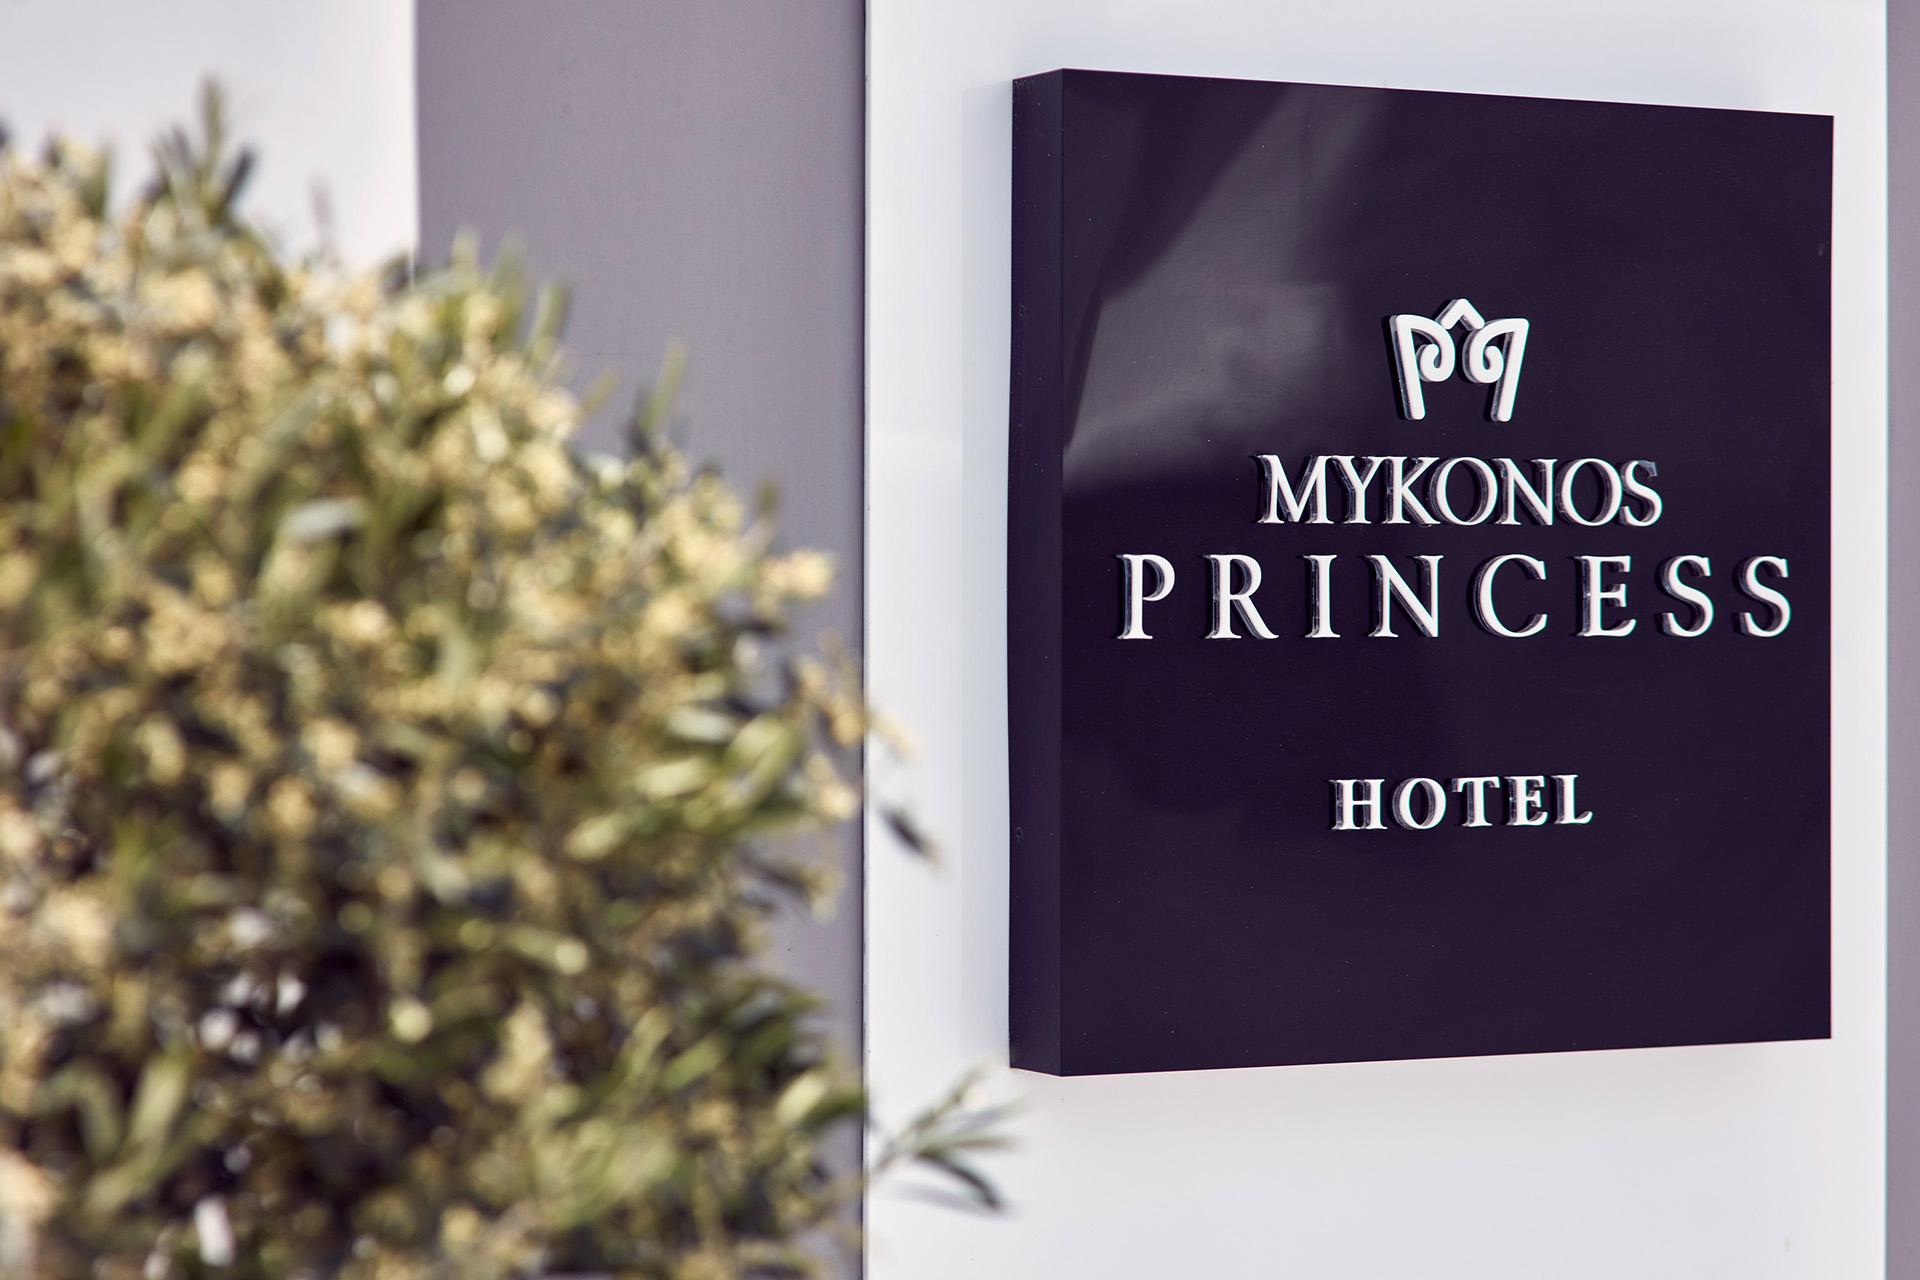 MYKONOS PRINCESS HOTEL